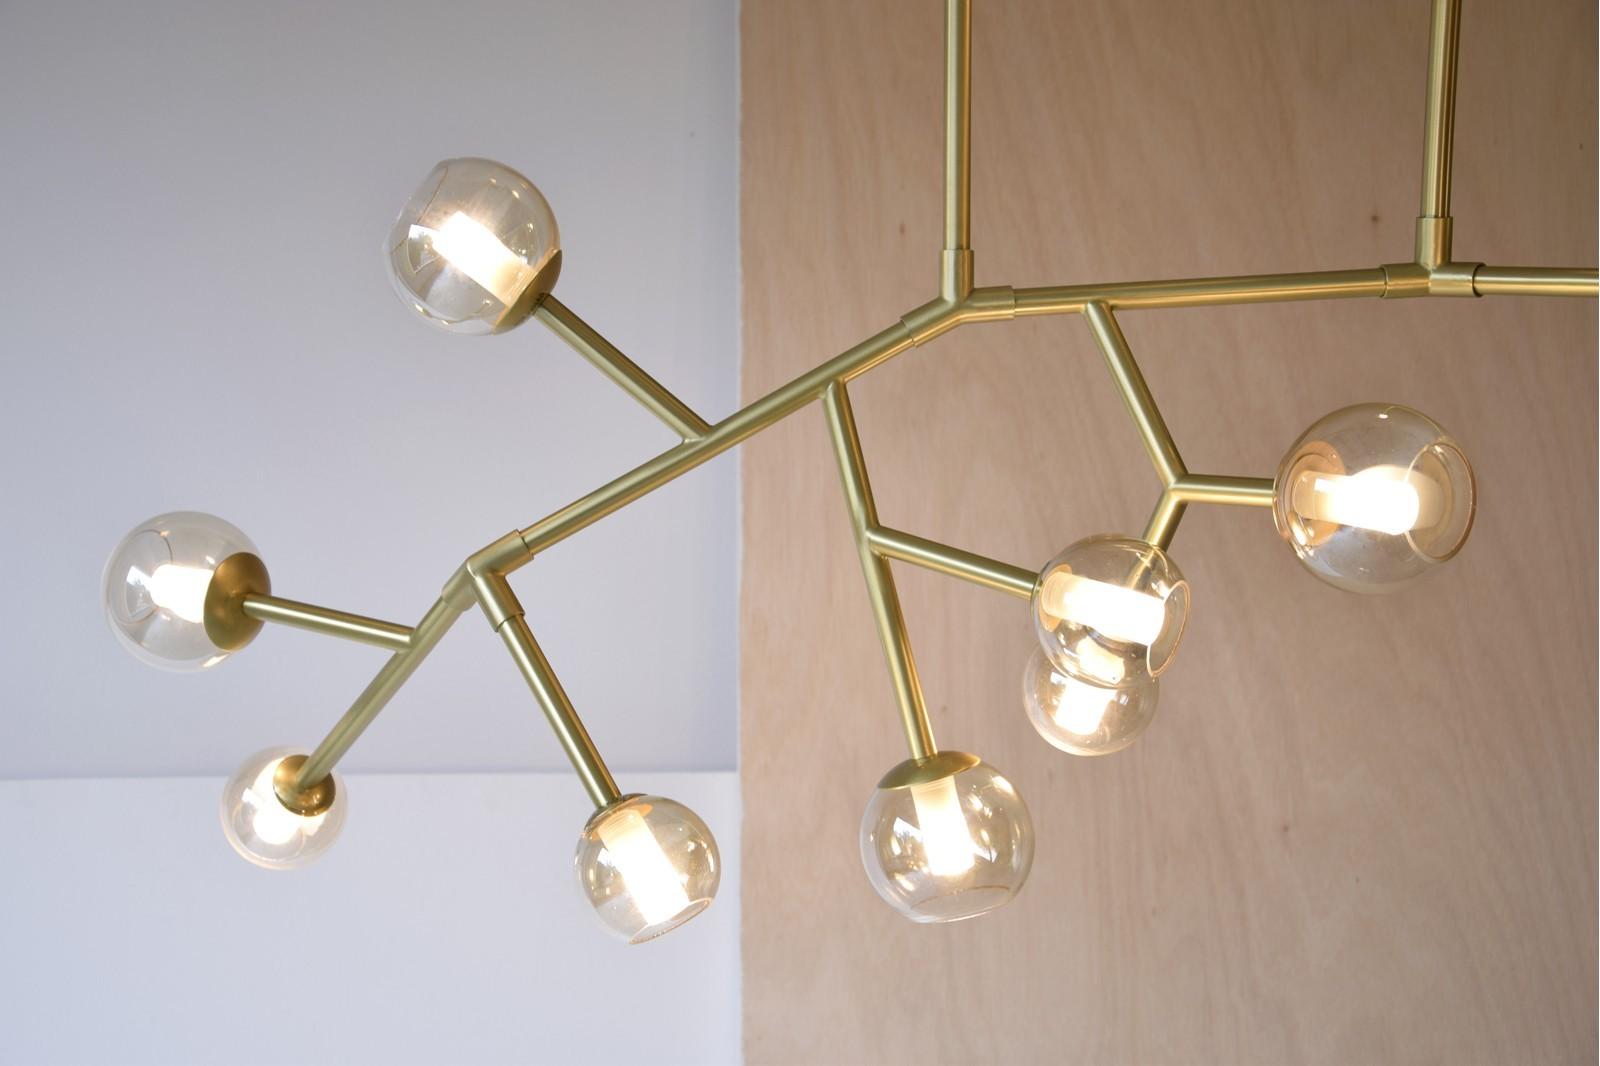 CEILING LAMP ORBALLO. METAL GLASS